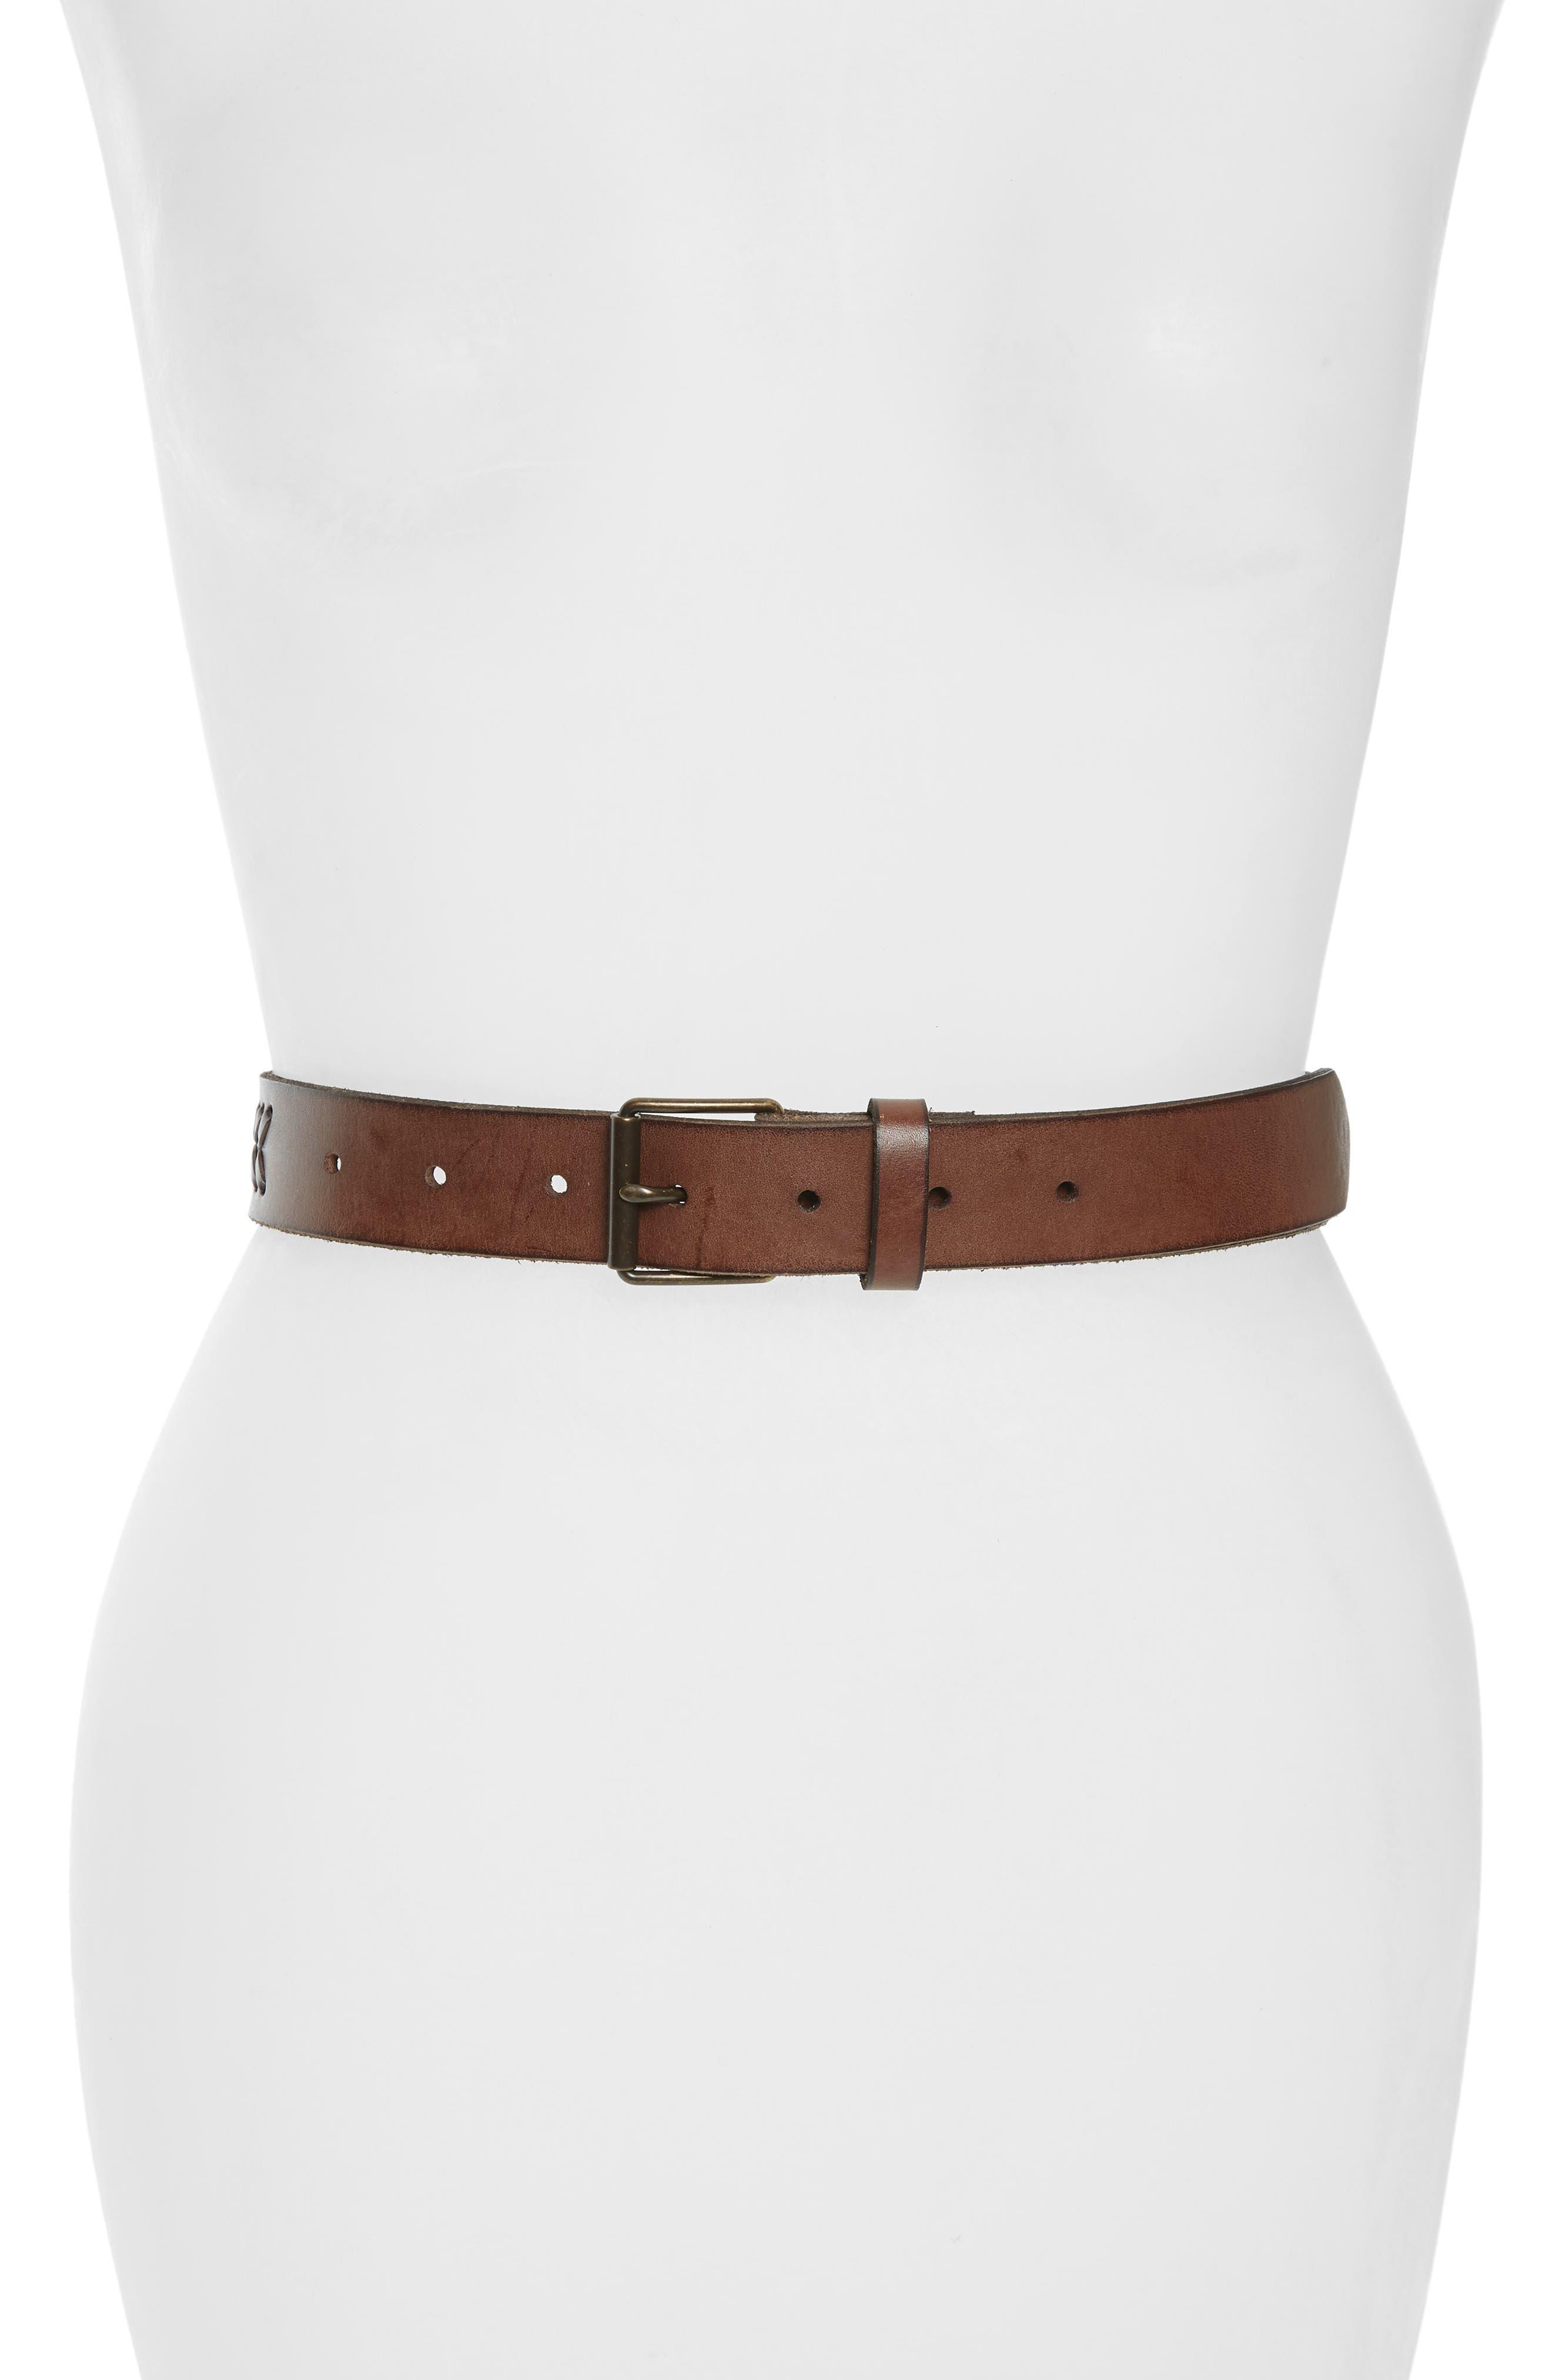 Treasure & Bond Whipstitch Leather Belt, Brown Saddle